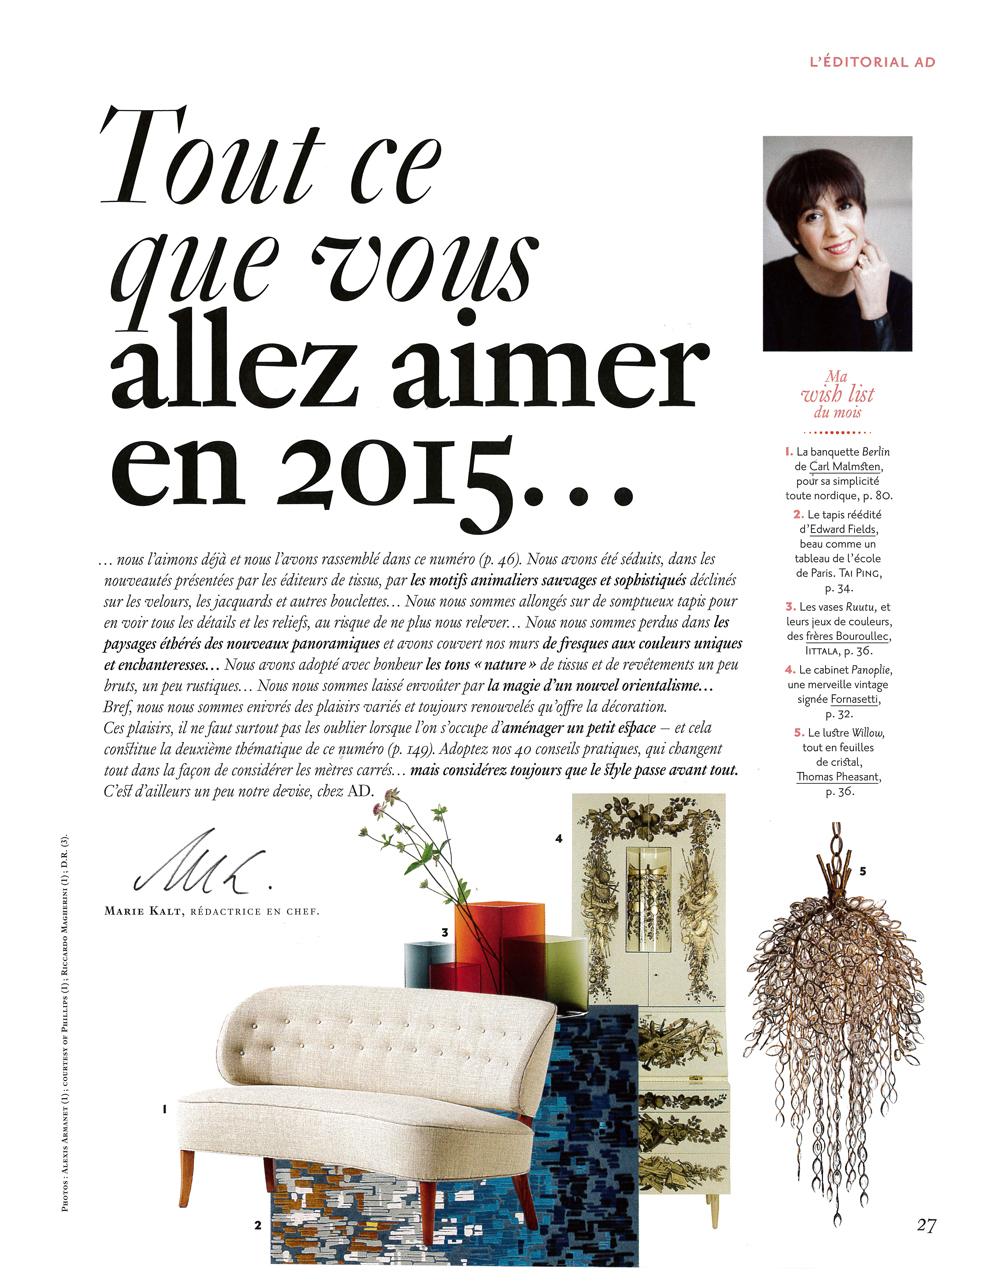 AD-France_2015_1_of2.jpg